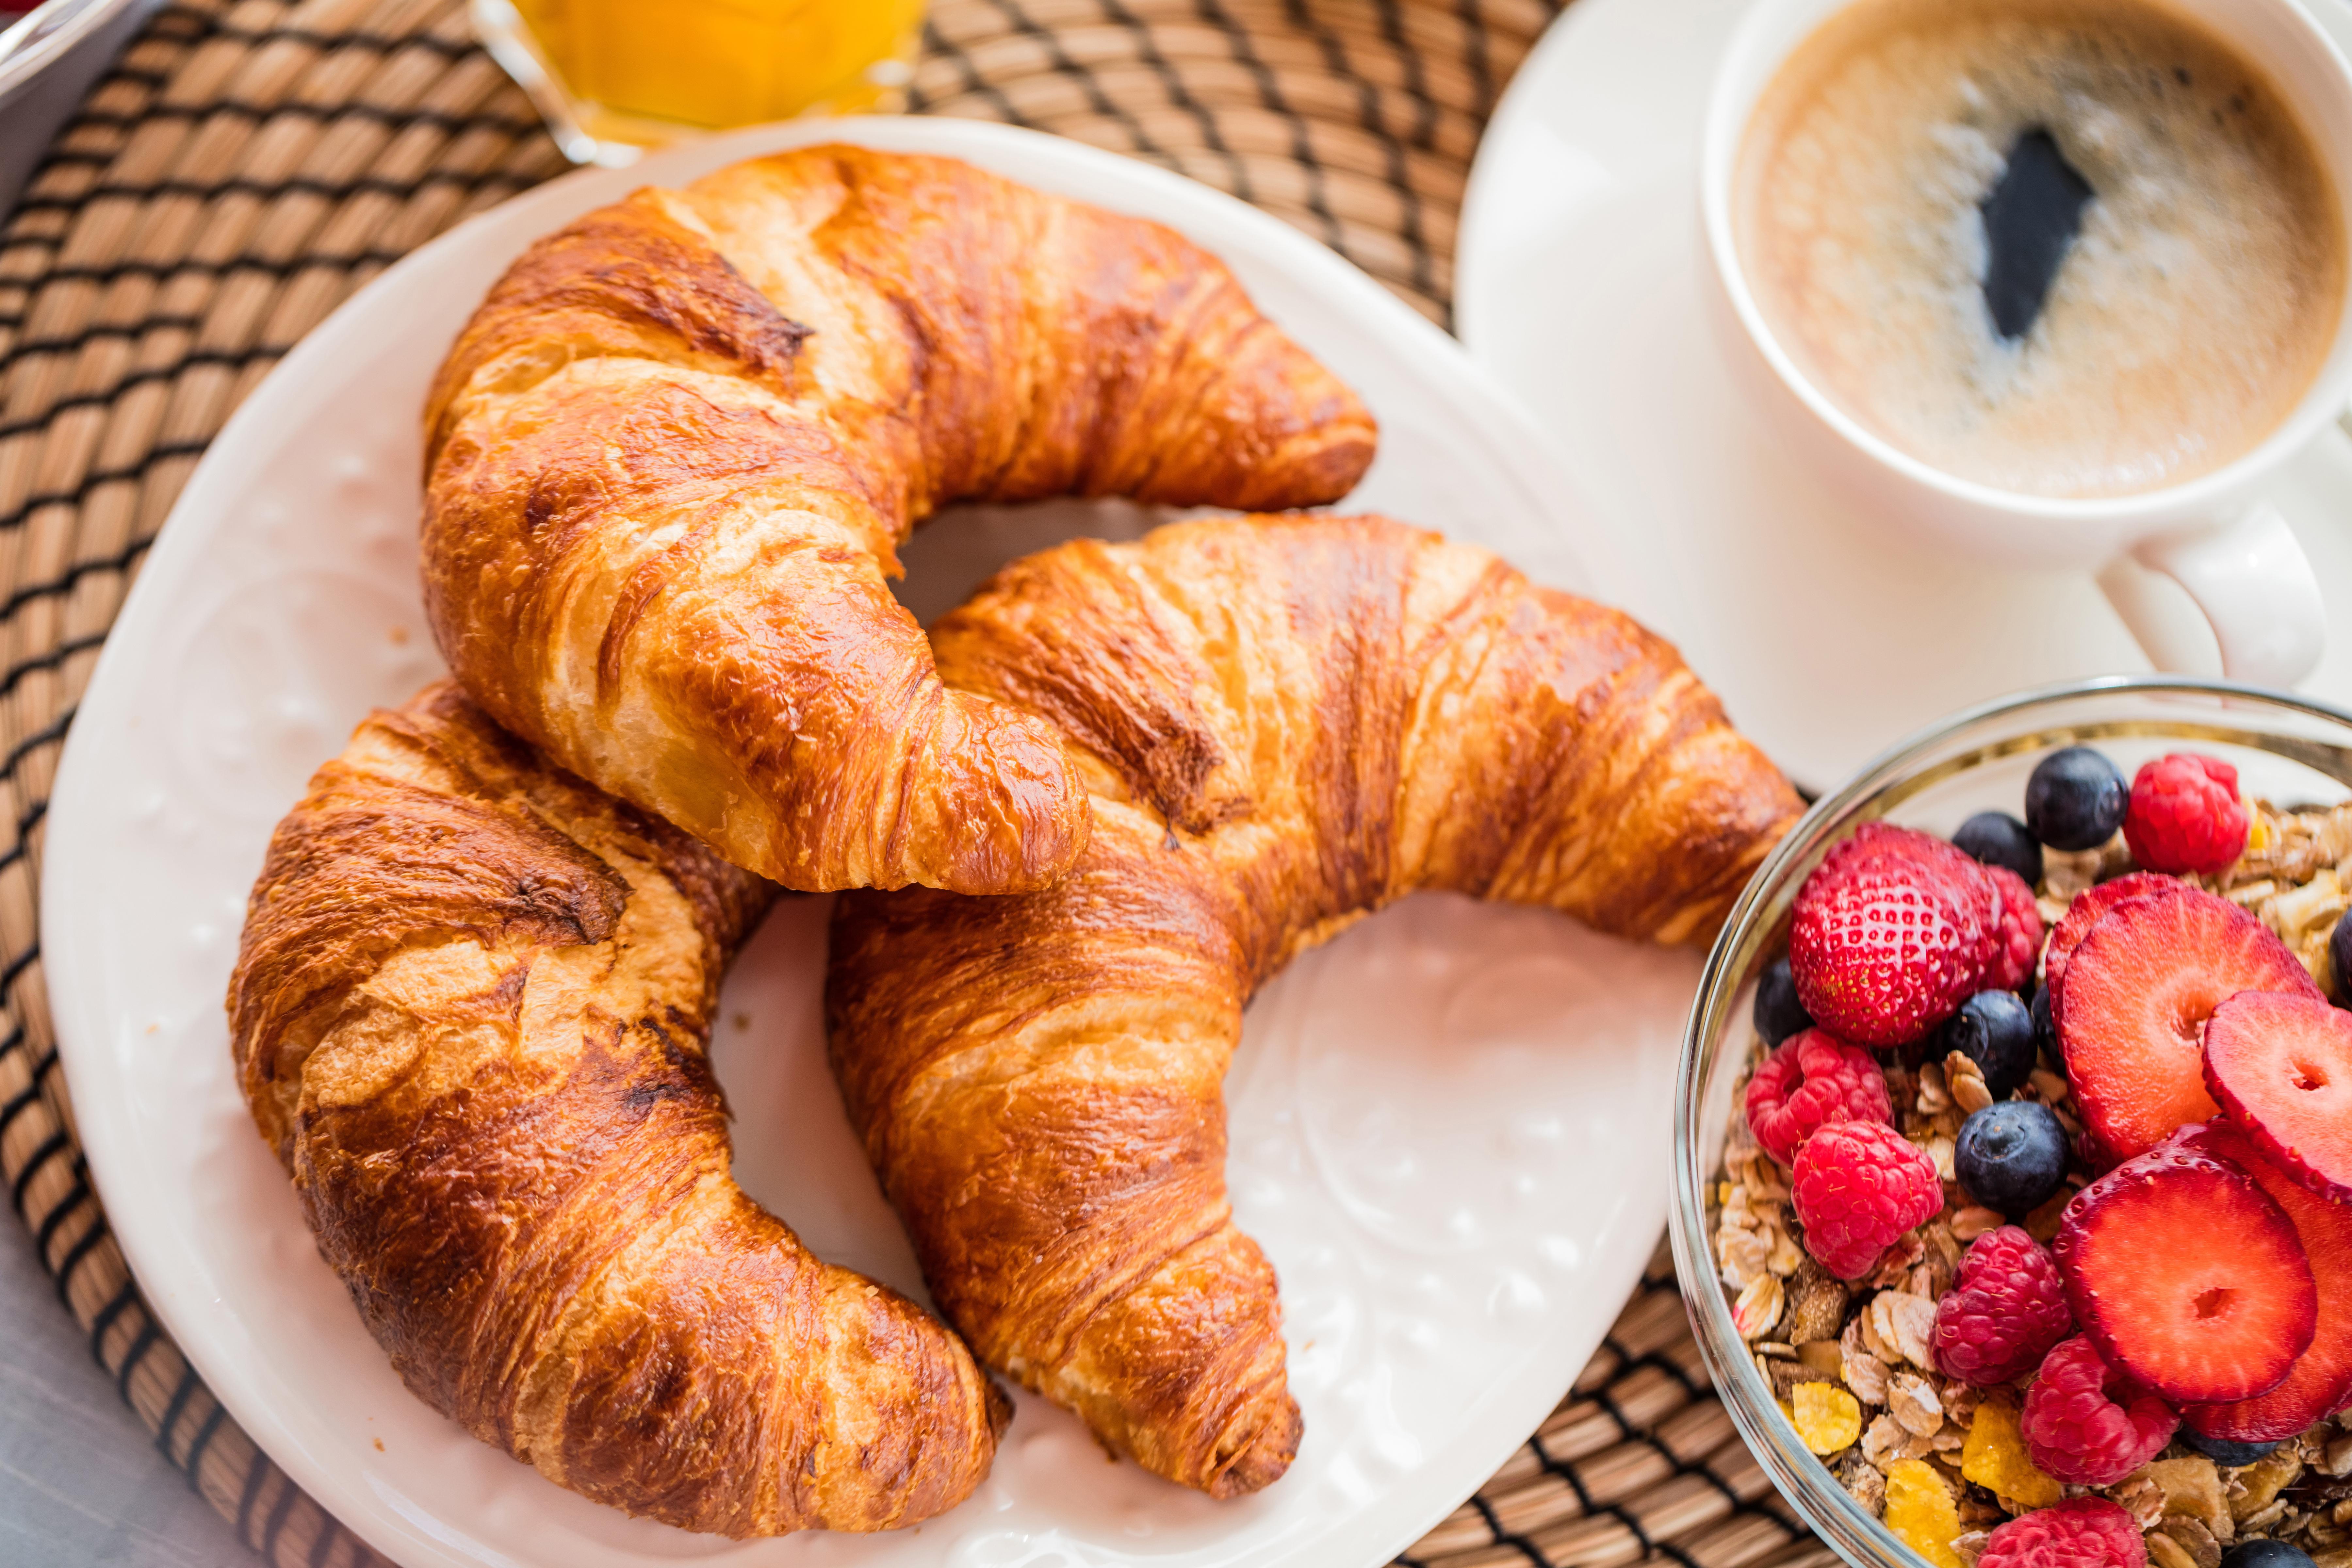 или картинки французского завтрака что